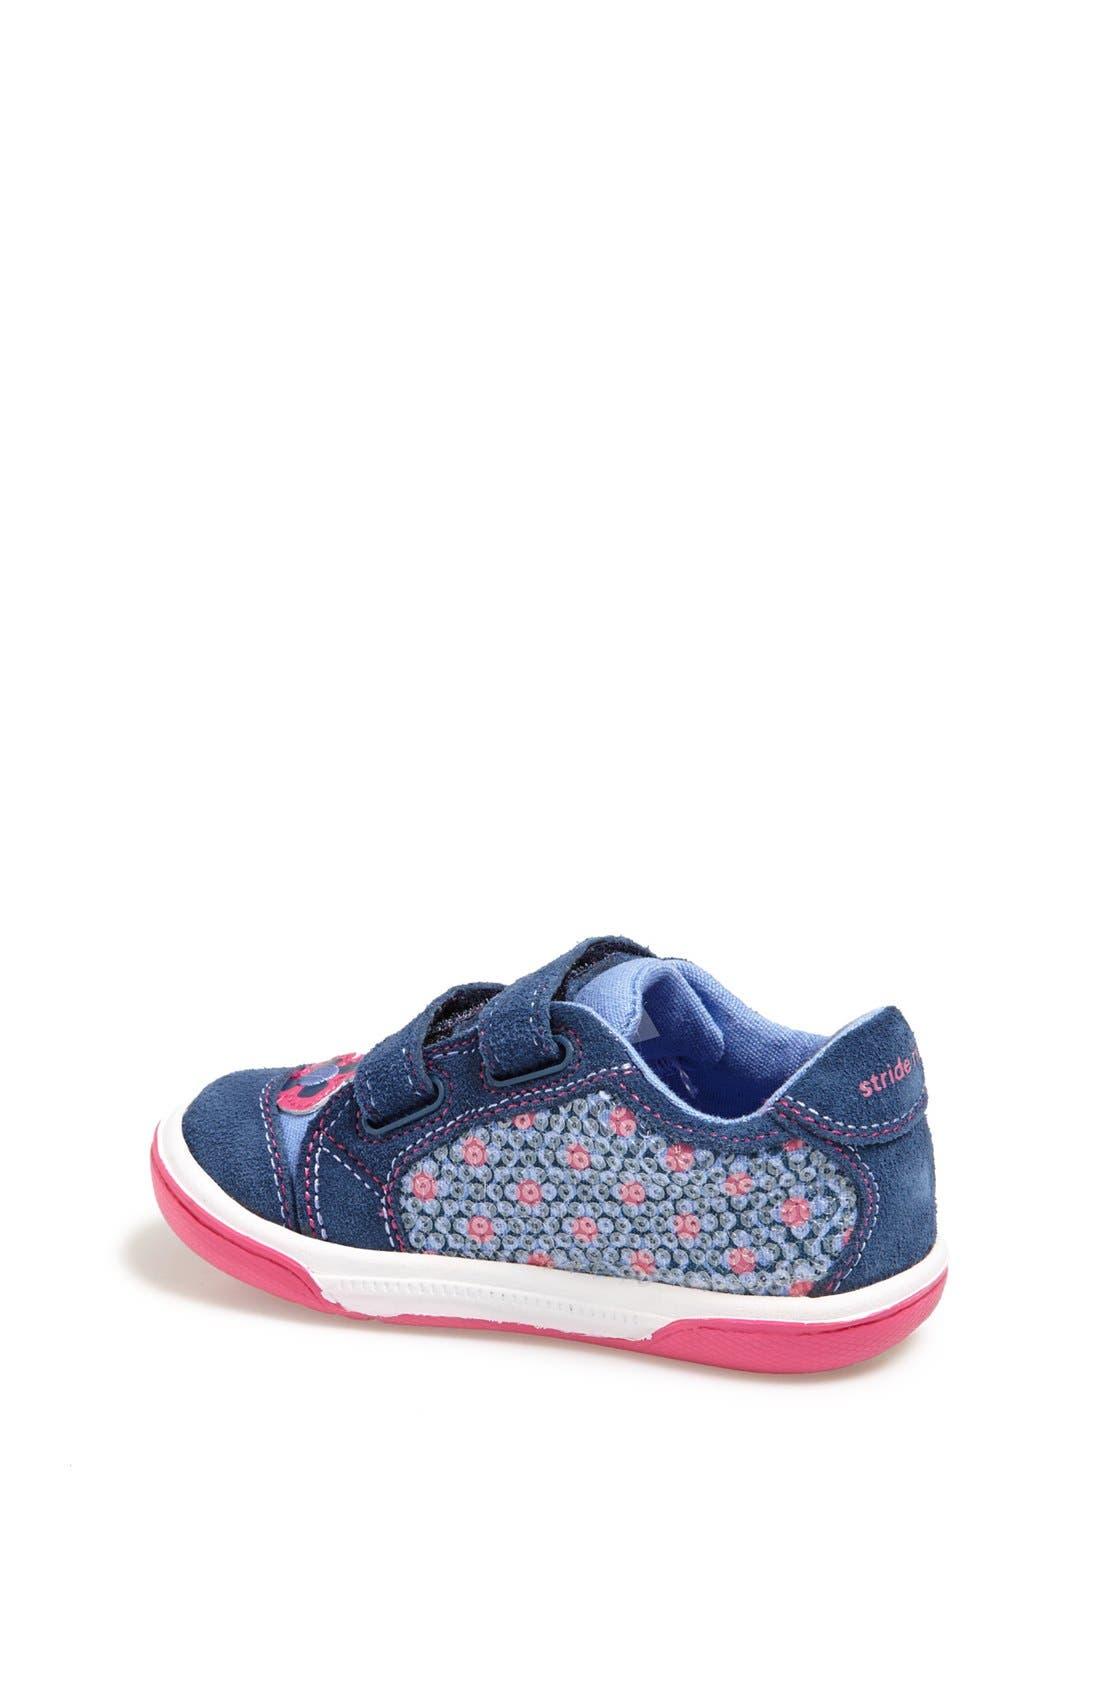 Alternate Image 2  - Stride Rite 'Ryder' Sneaker (Baby, Walker & Toddler)